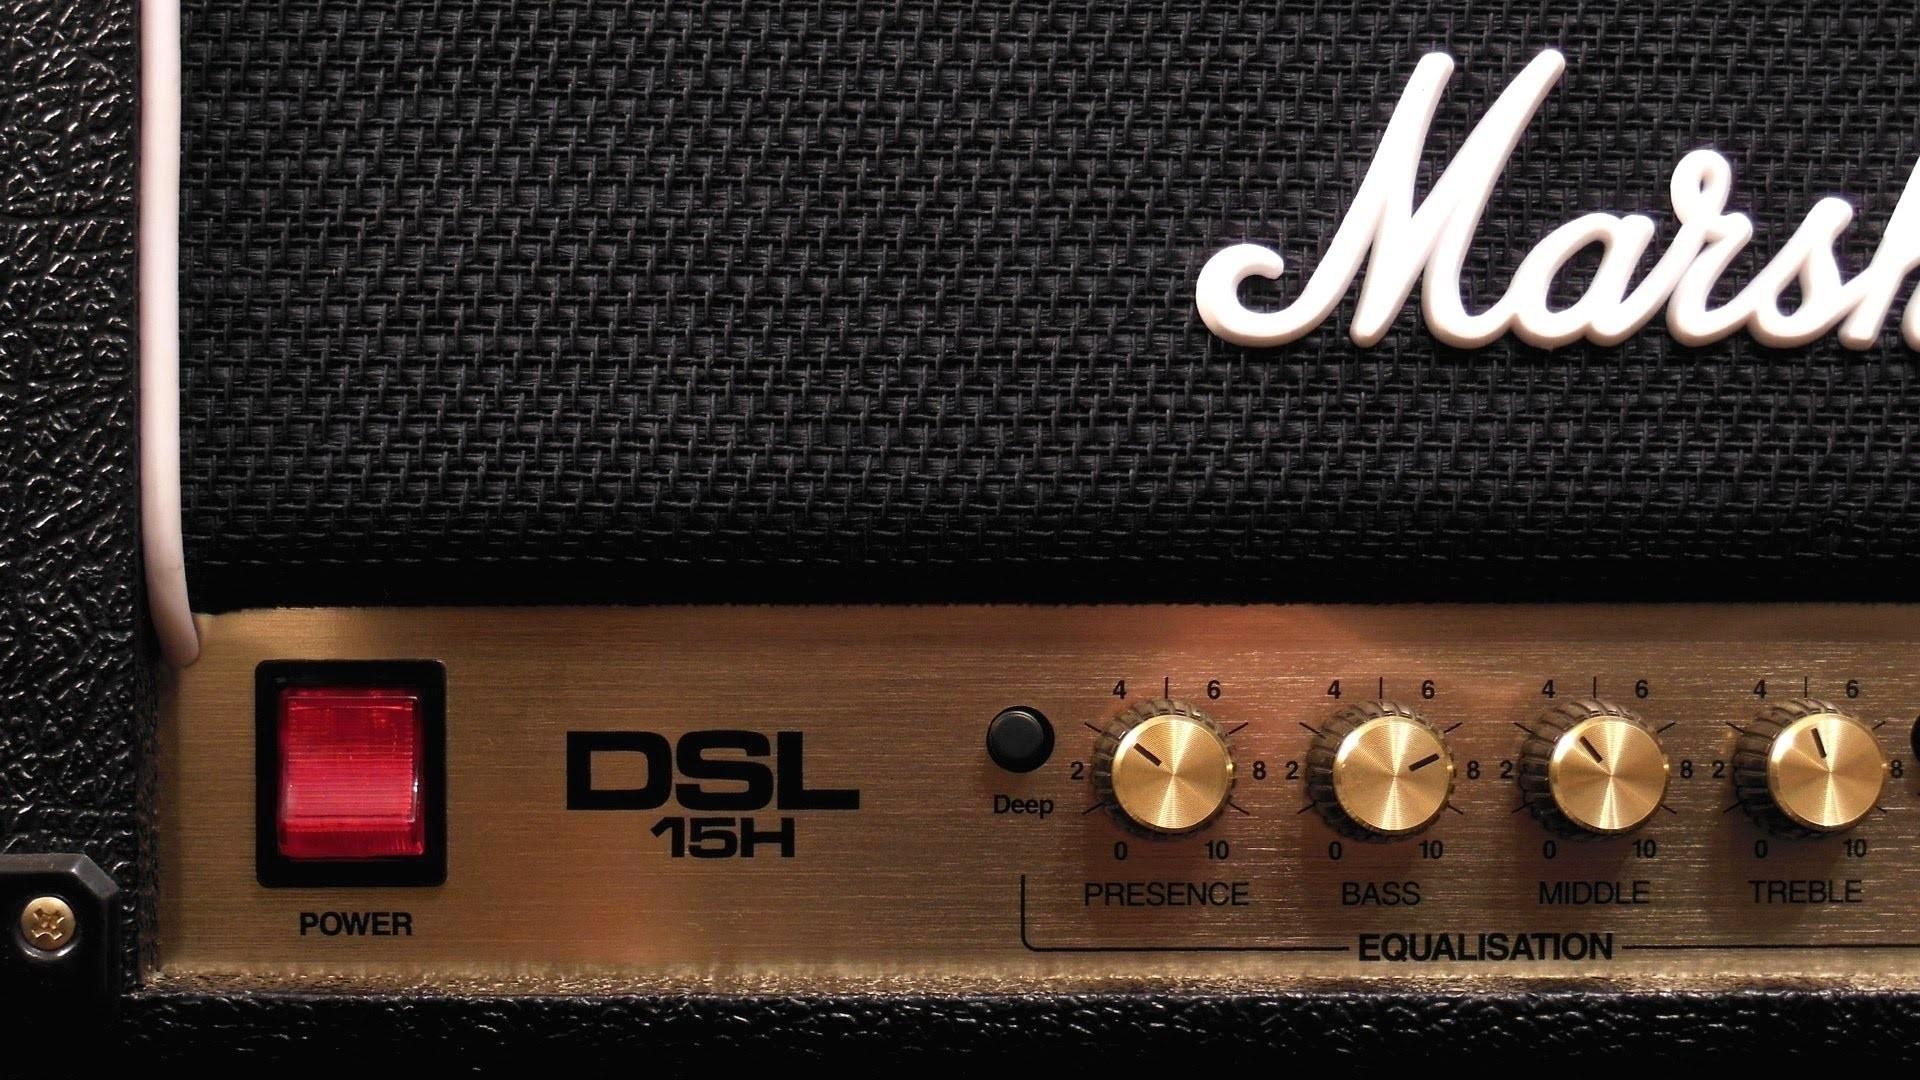 Marshall DSL 15H Quick Testing